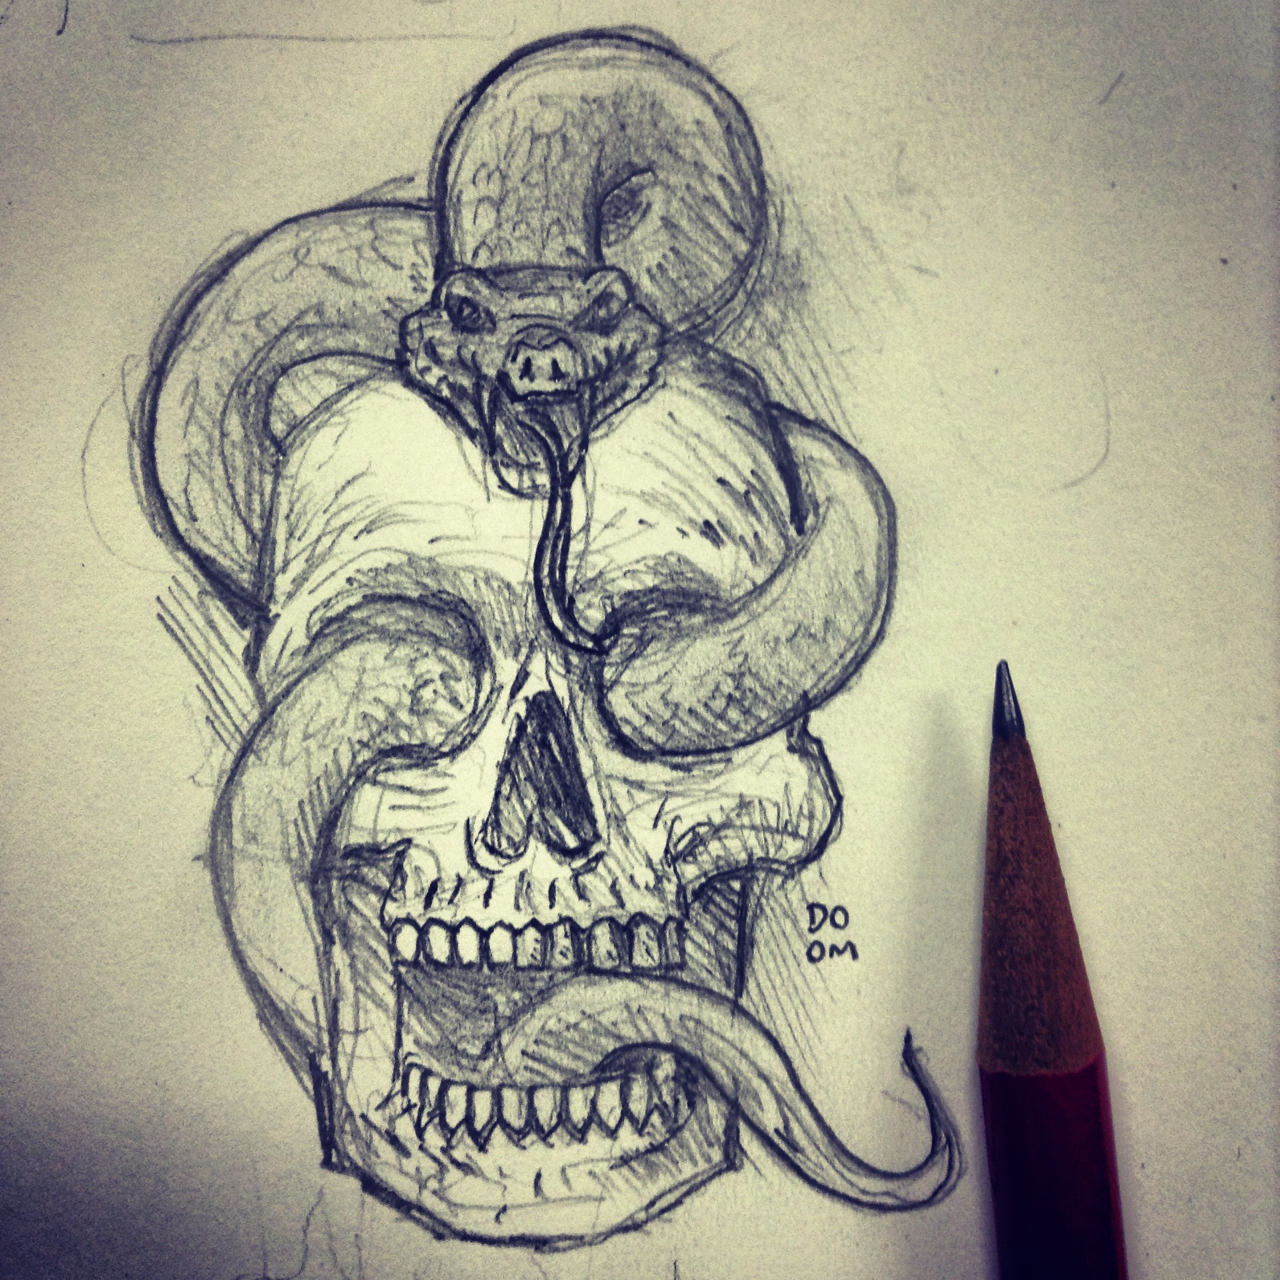 Drawn skull snake PSD  a of Snake